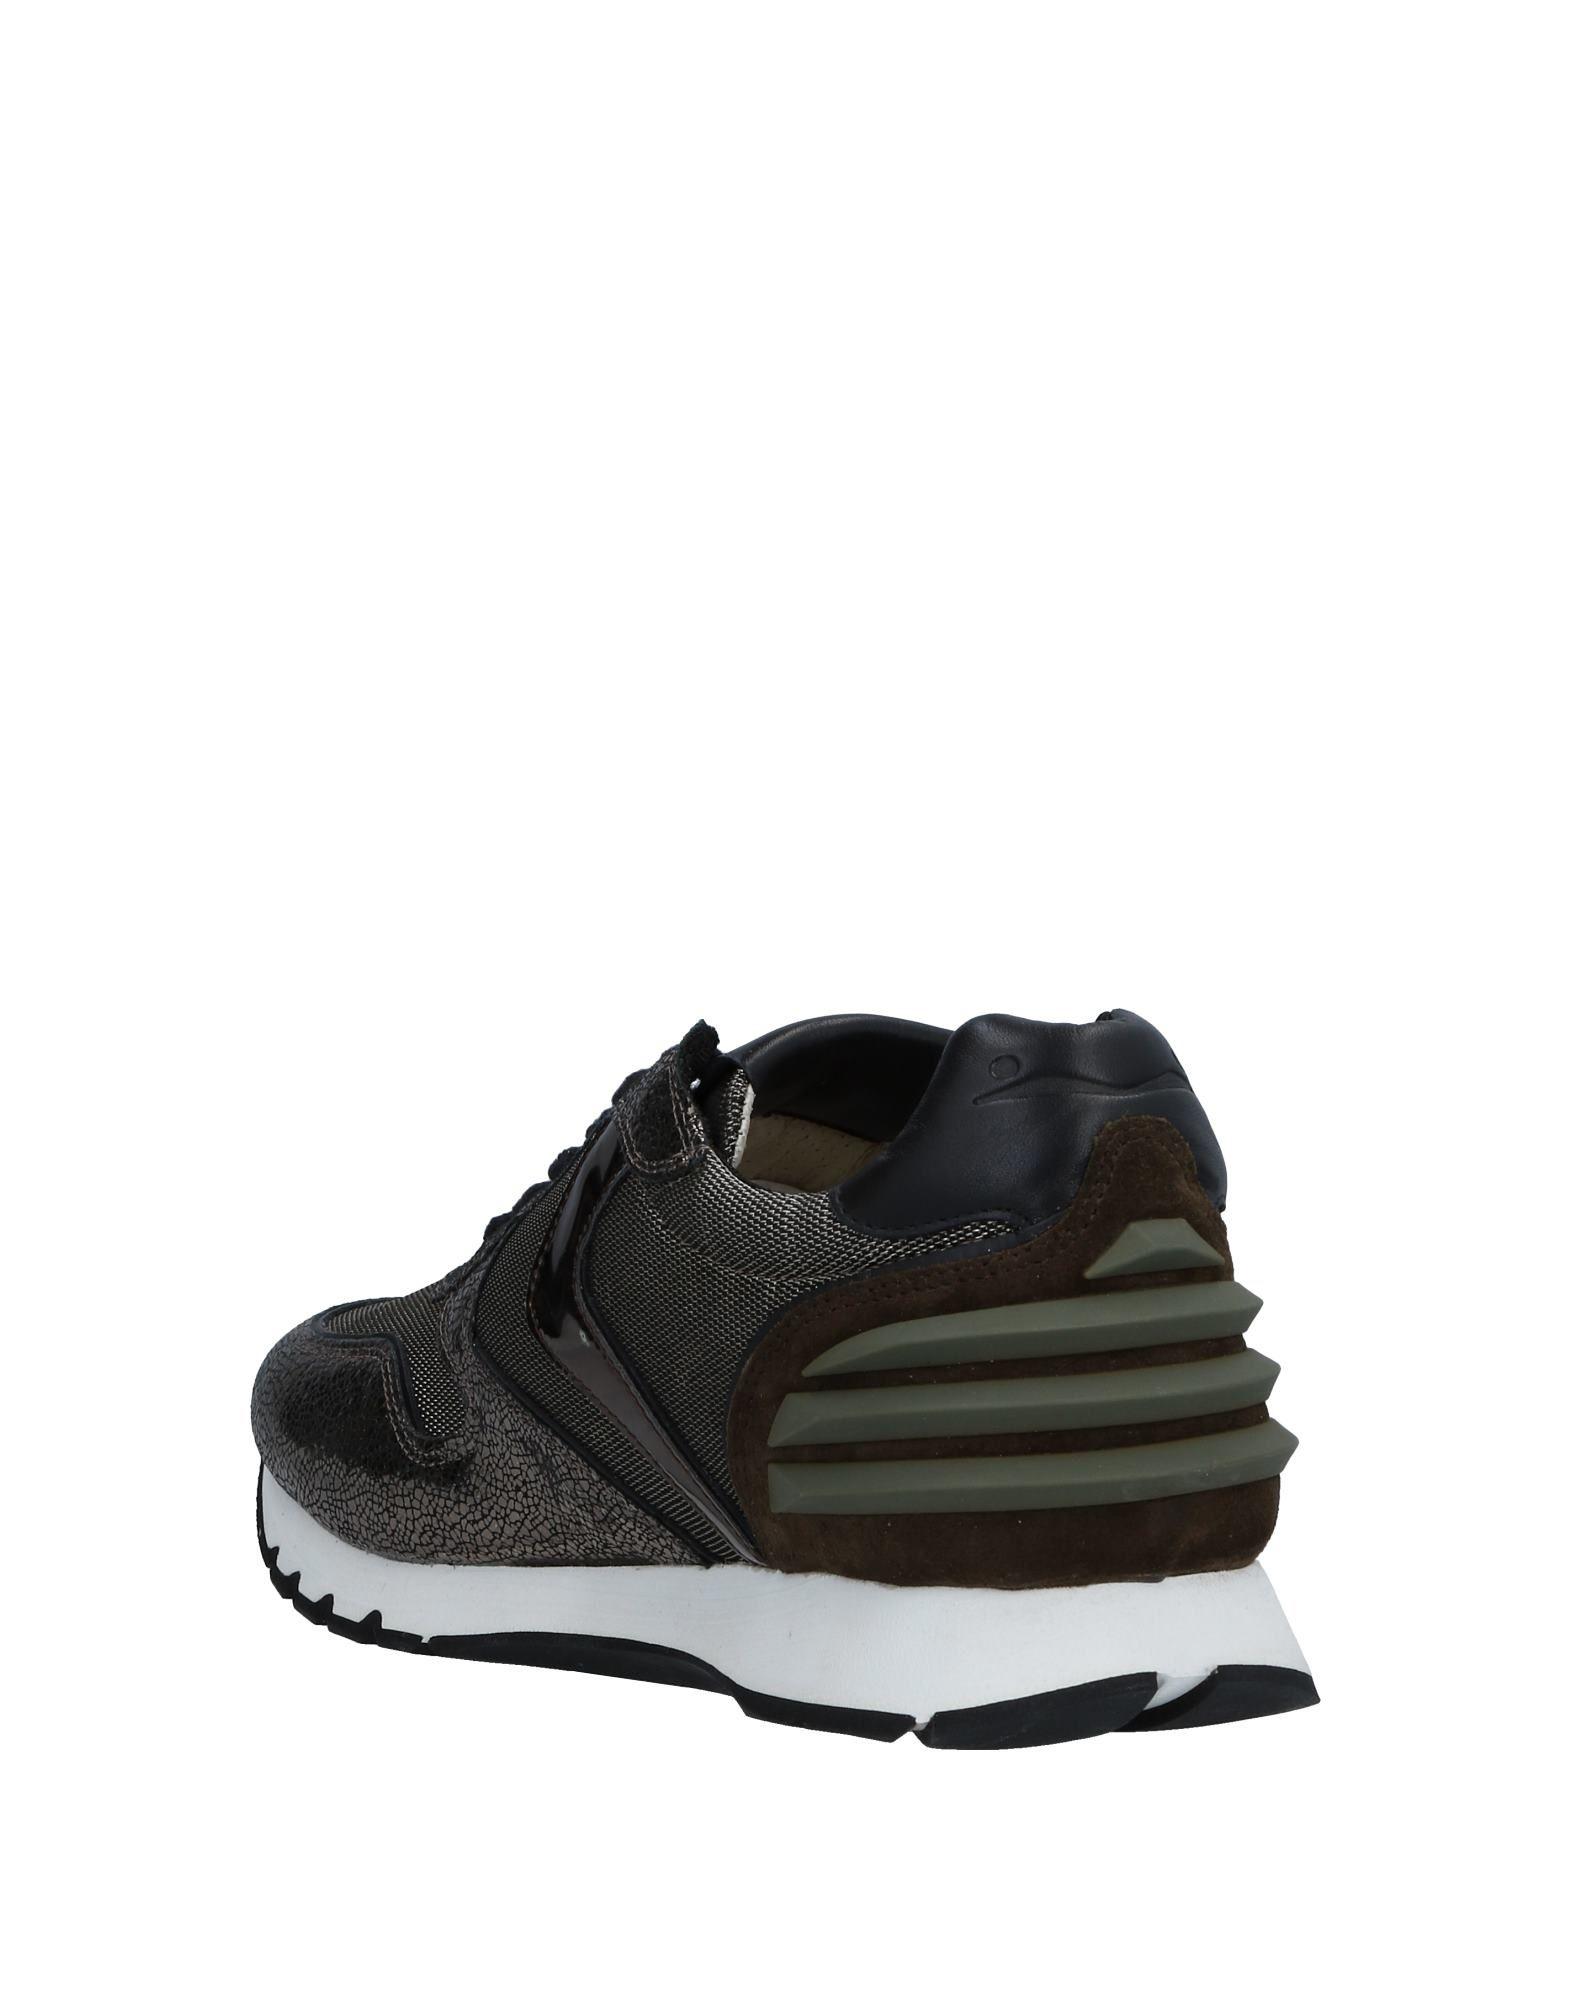 Voile 11534607IN Blanche Sneakers Herren  11534607IN Voile Gute Qualität beliebte Schuhe ad7f40